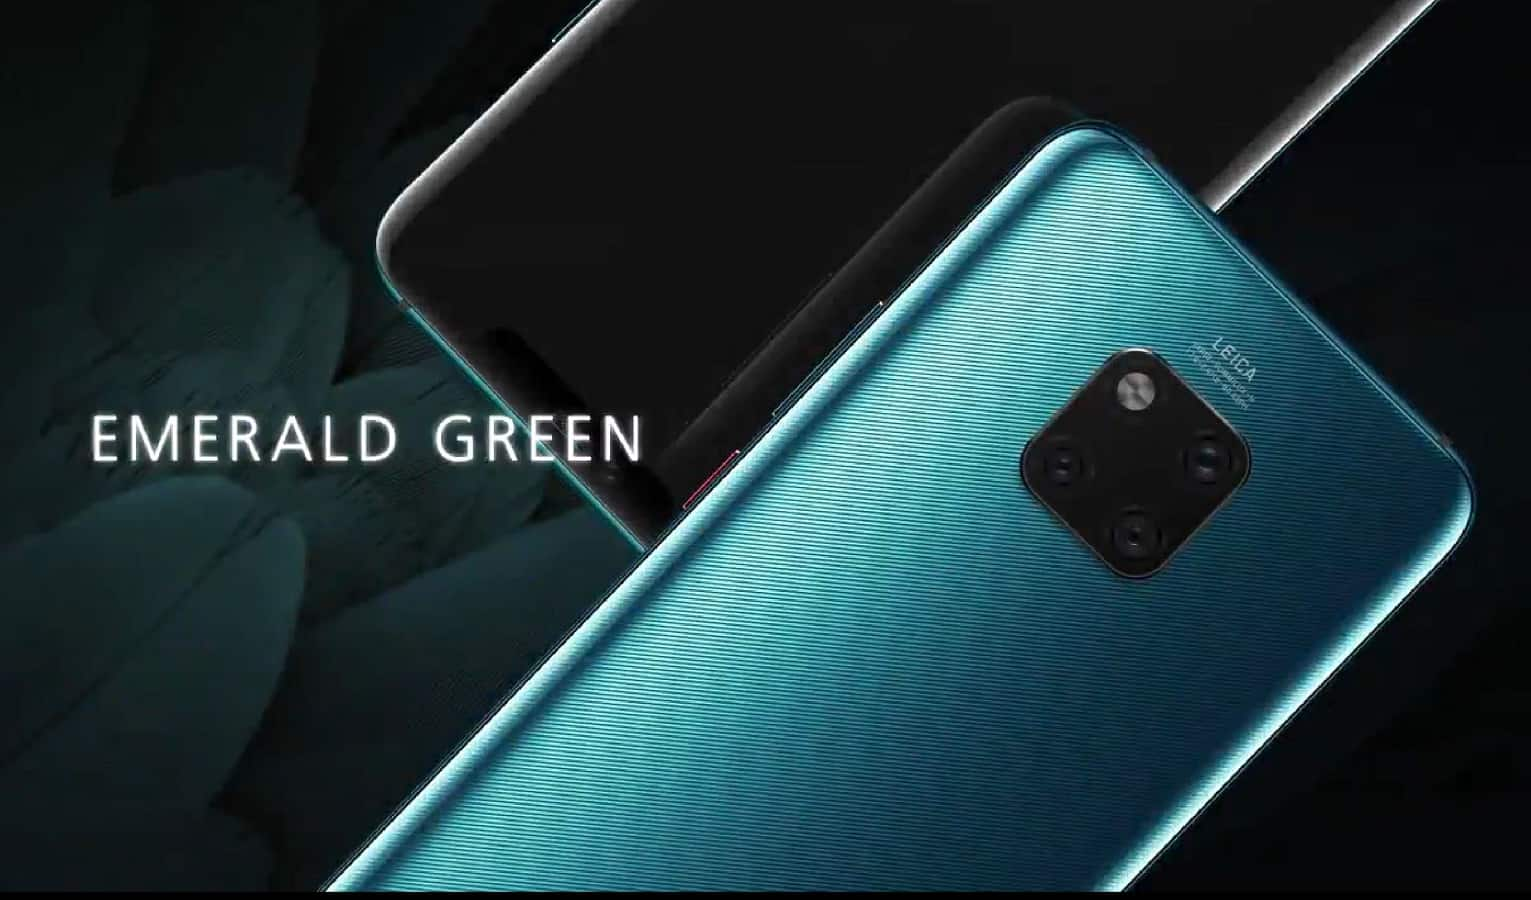 Huawei Mate 20 Emerald Green